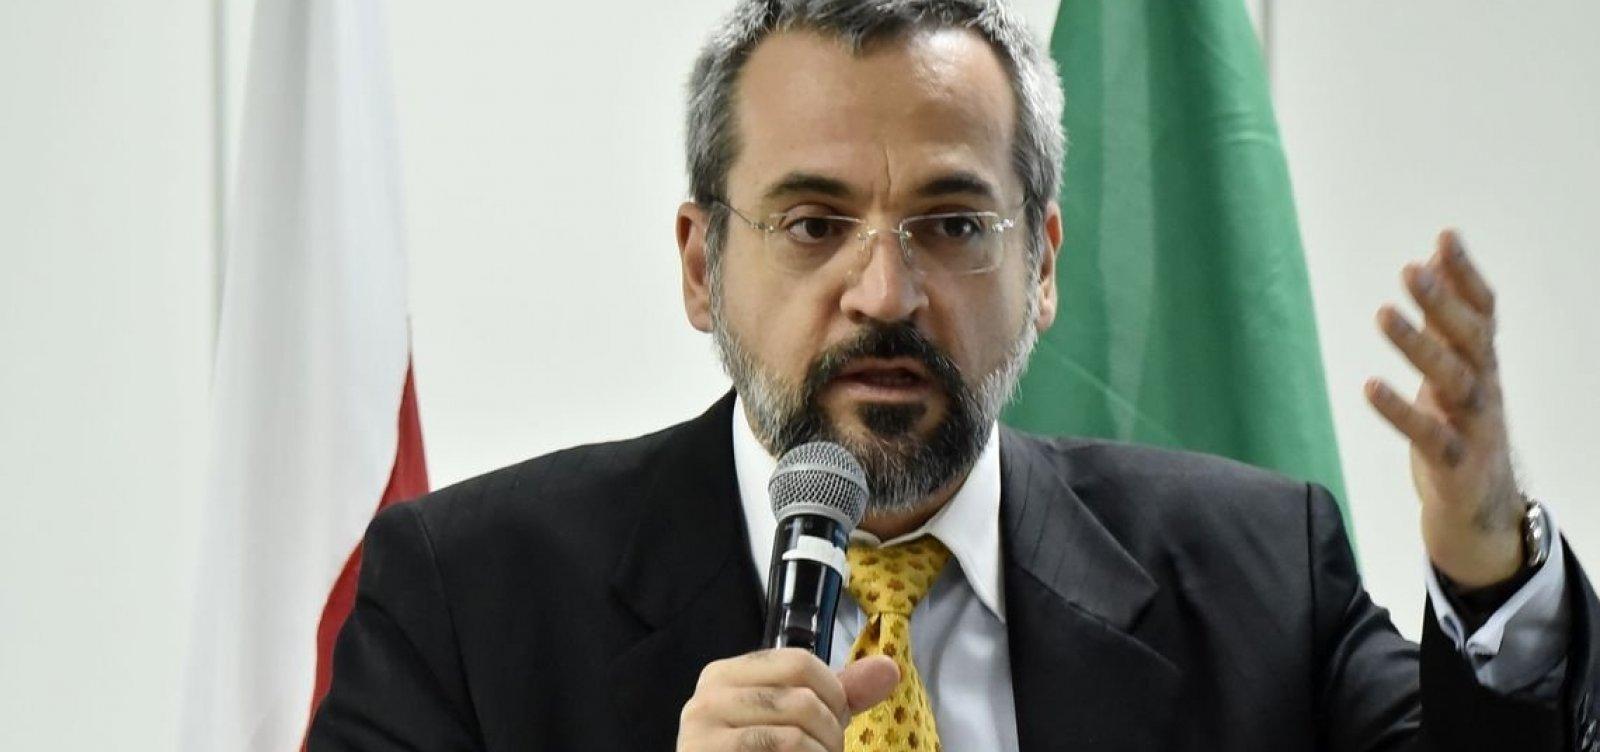 [MEC corta 30% do orçamento da Ufba e outras duas universidades por 'balbúrdia']